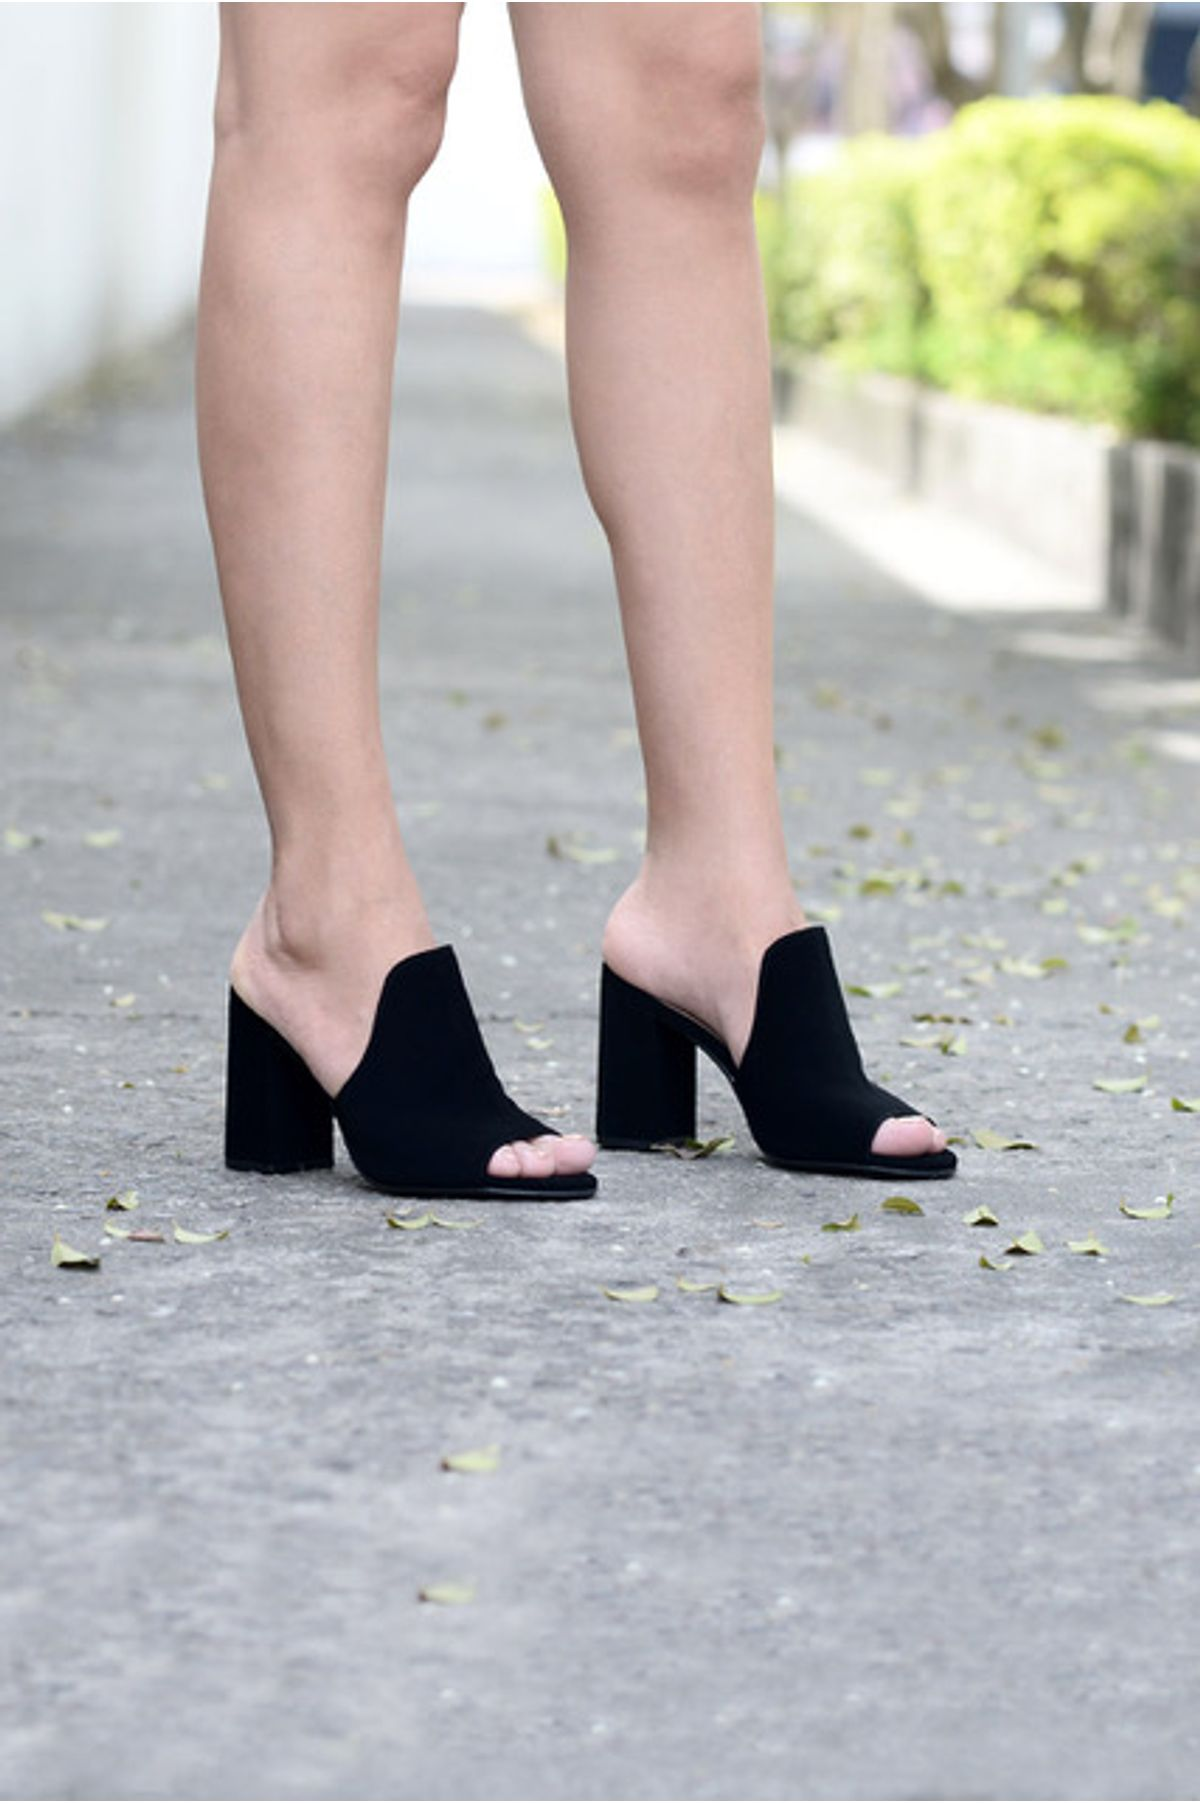 bd416347f87 Tamanco Feminino Salto Alto Amye Mundial NB - PRETO - Mundial Calçados